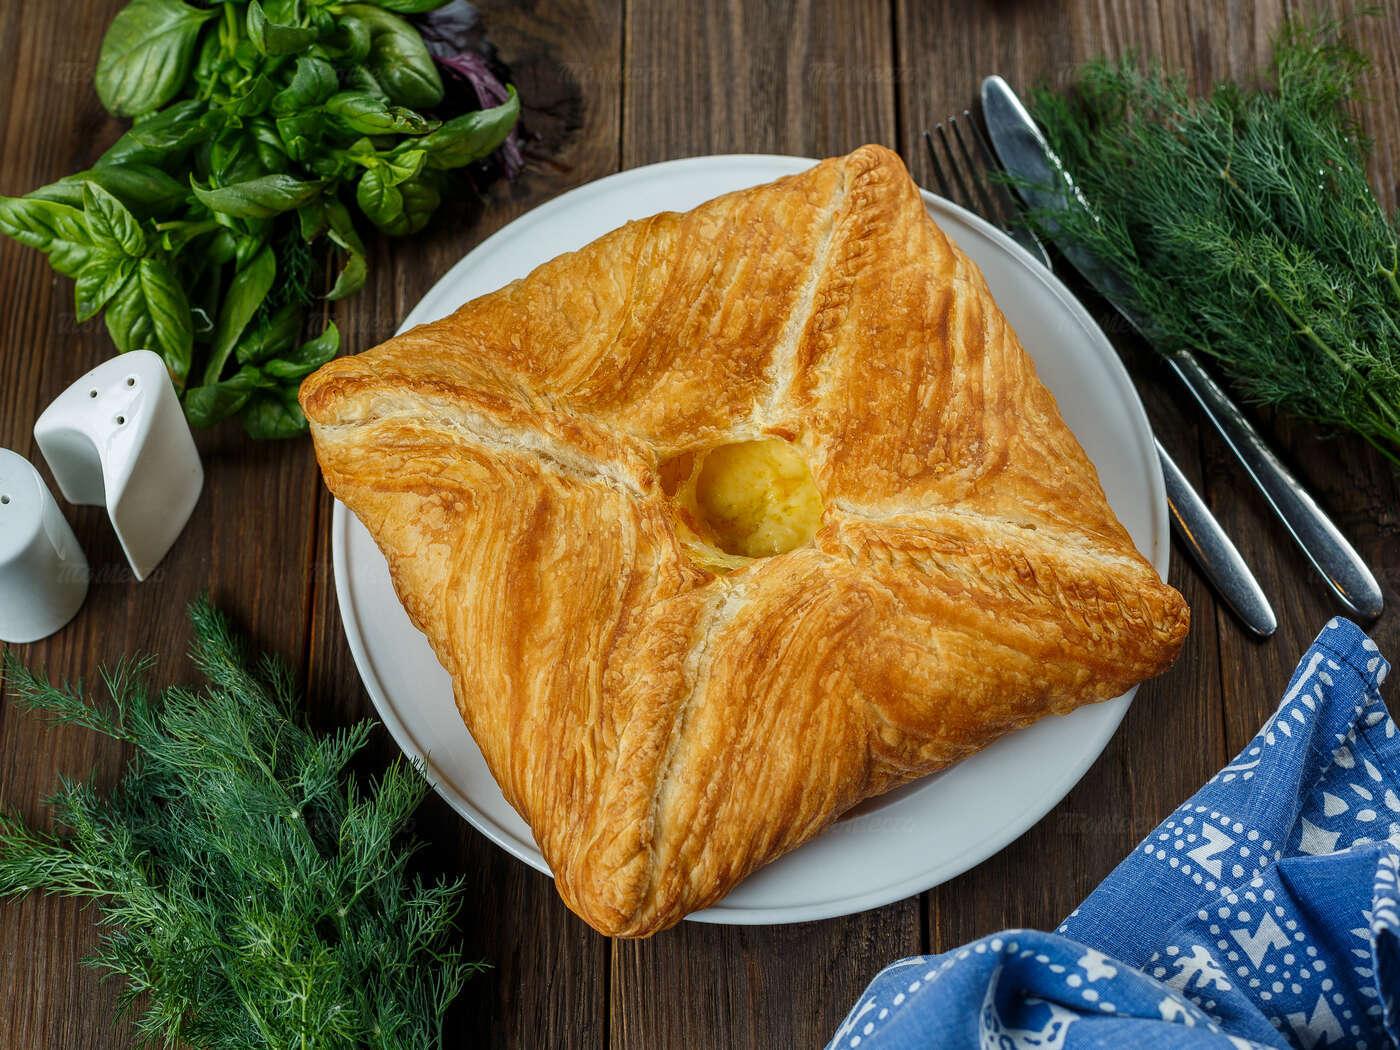 Меню кафе Хинкали & Хачапури на Льва Толстого фото 7